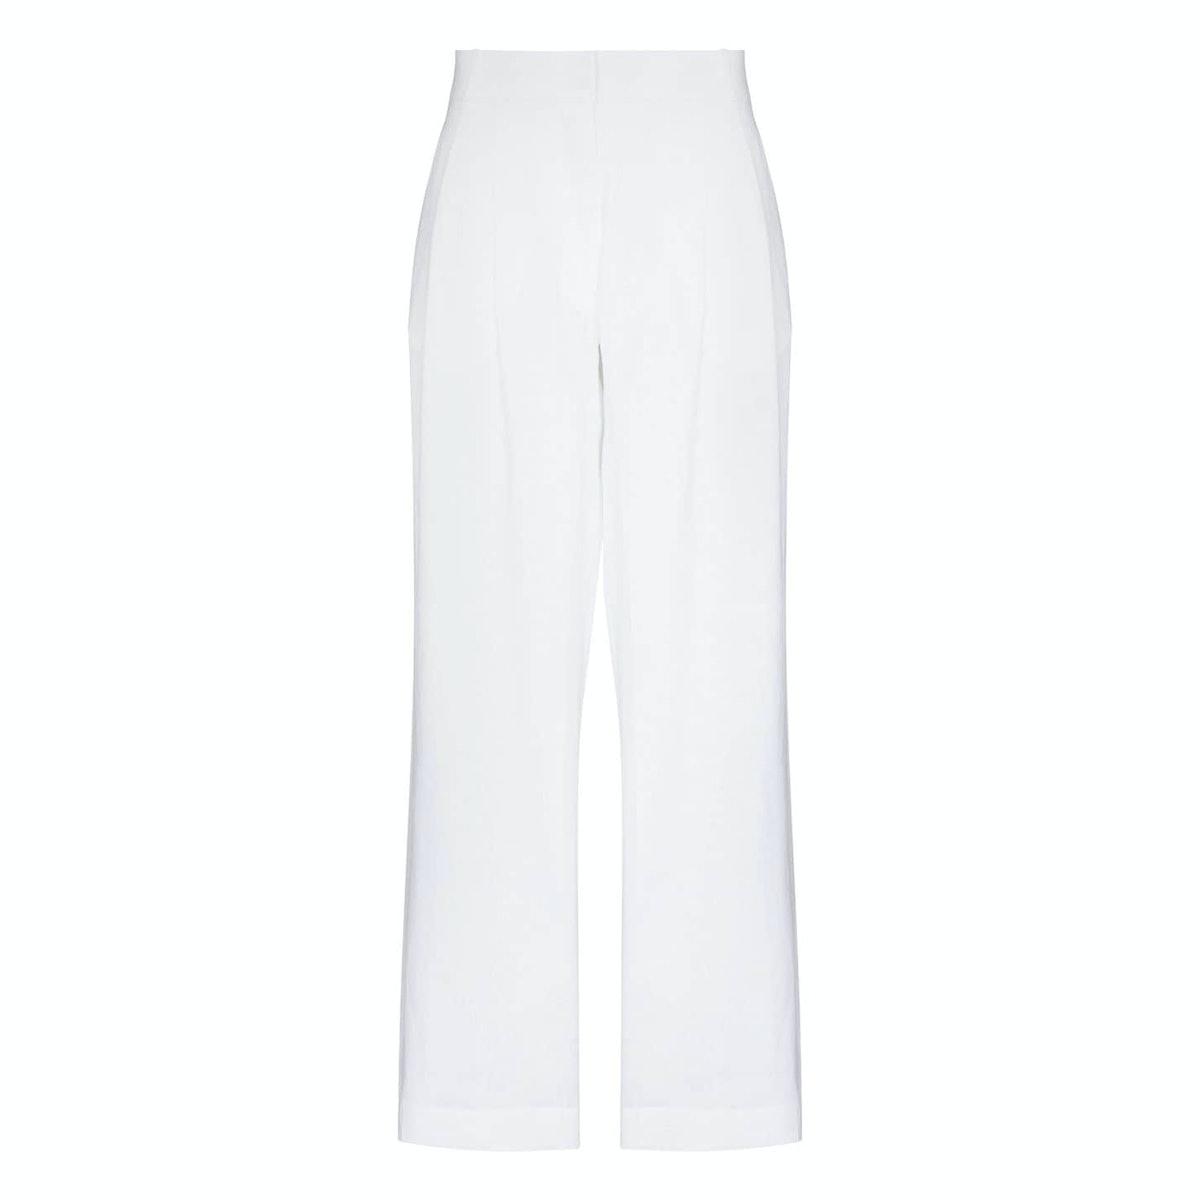 Asceno Trousers